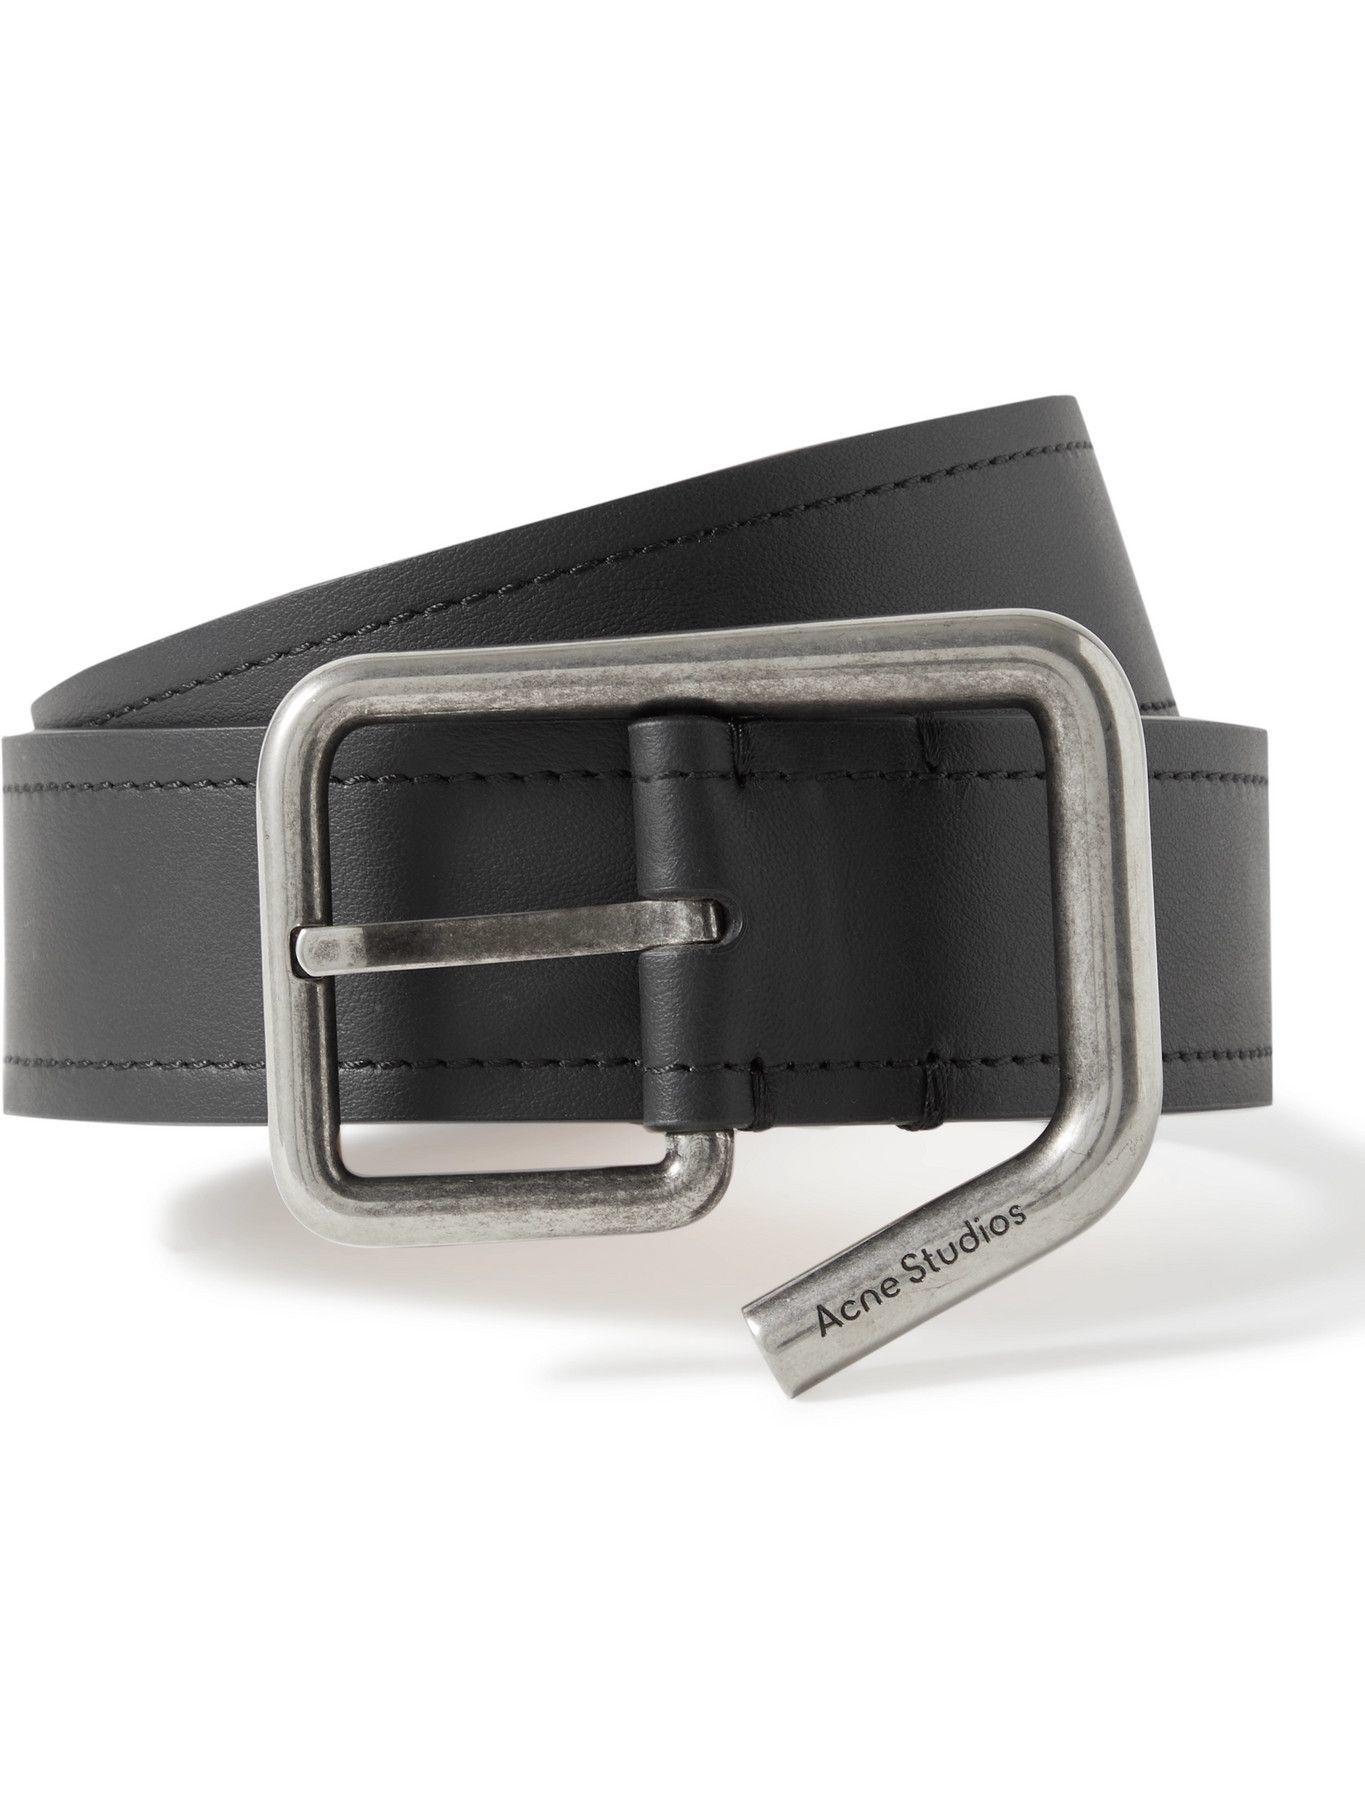 Acne Studios - 3.5cm Leather Belt - Black